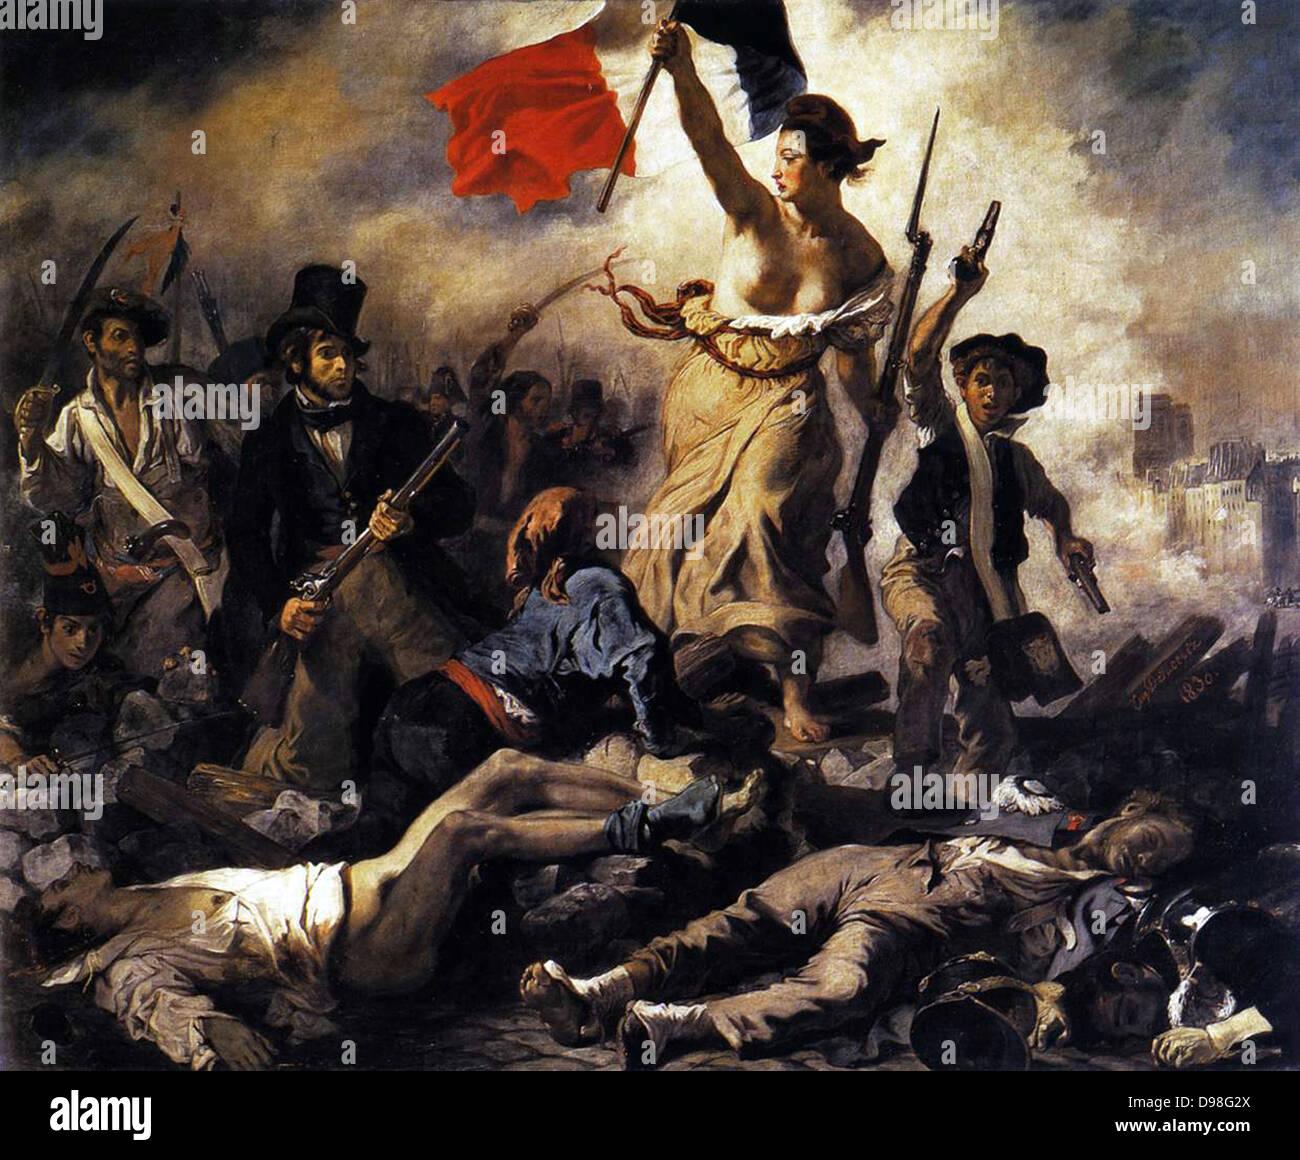 Eugene Delacroix (1798-1863) French Romantic painter. Liberty Leading the People (1830) Stock Photo